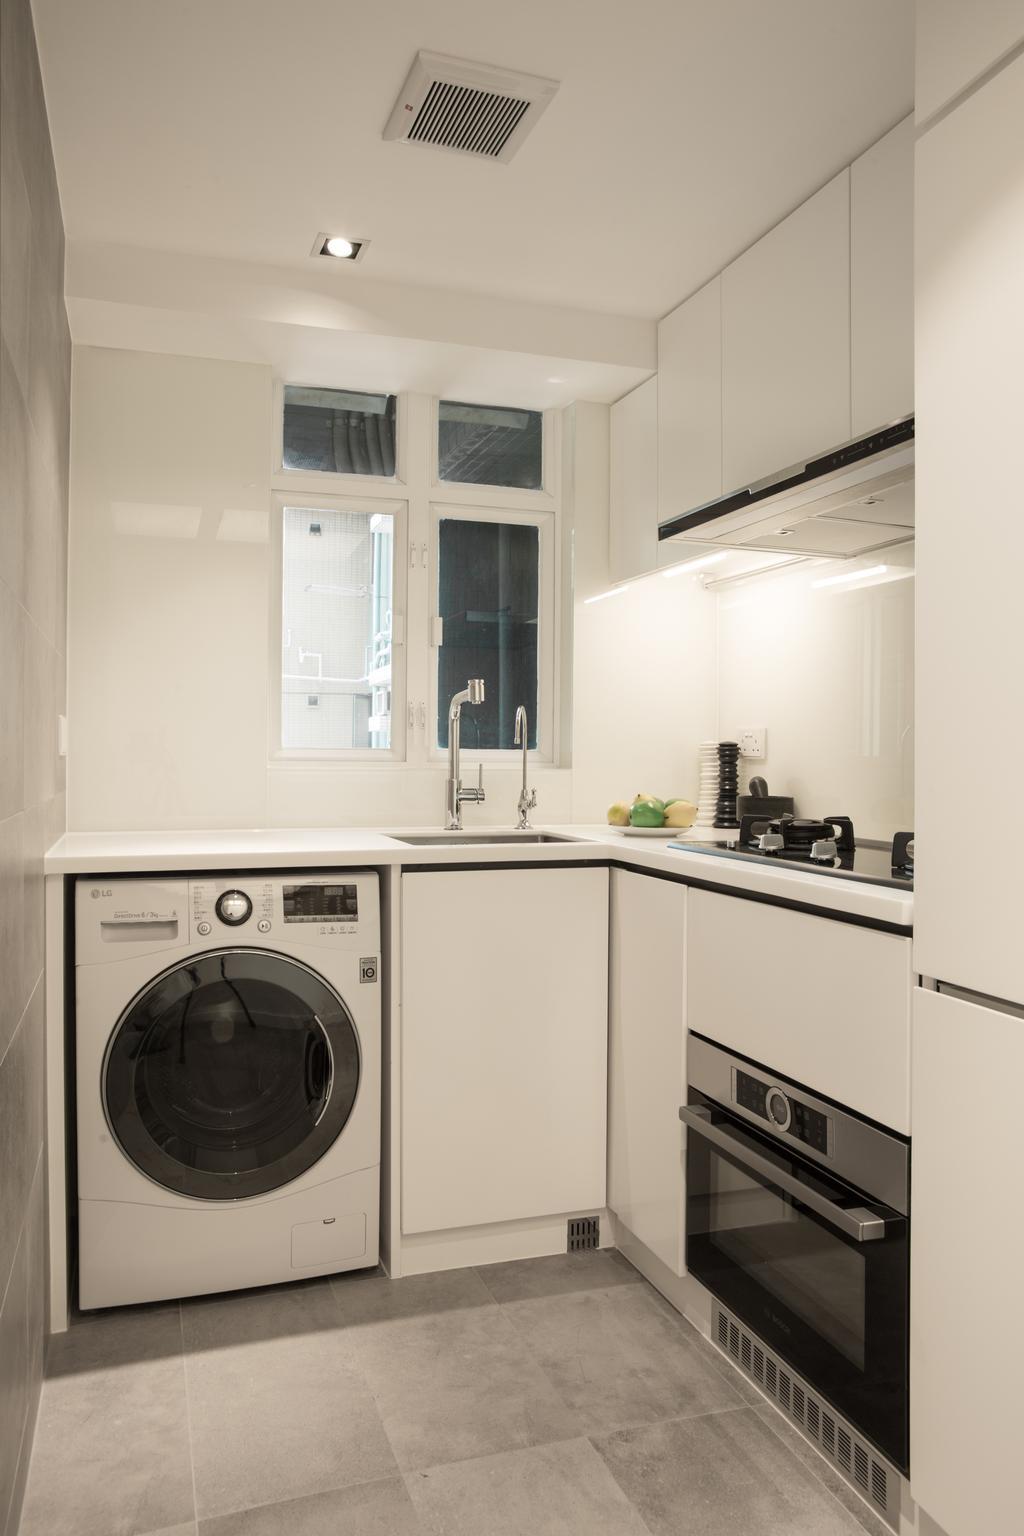 簡約, 私家樓, 廚房, 港麗豪園, 室內設計師, in Him's Interior Design, 北歐, Appliance, Electrical Device, Washer